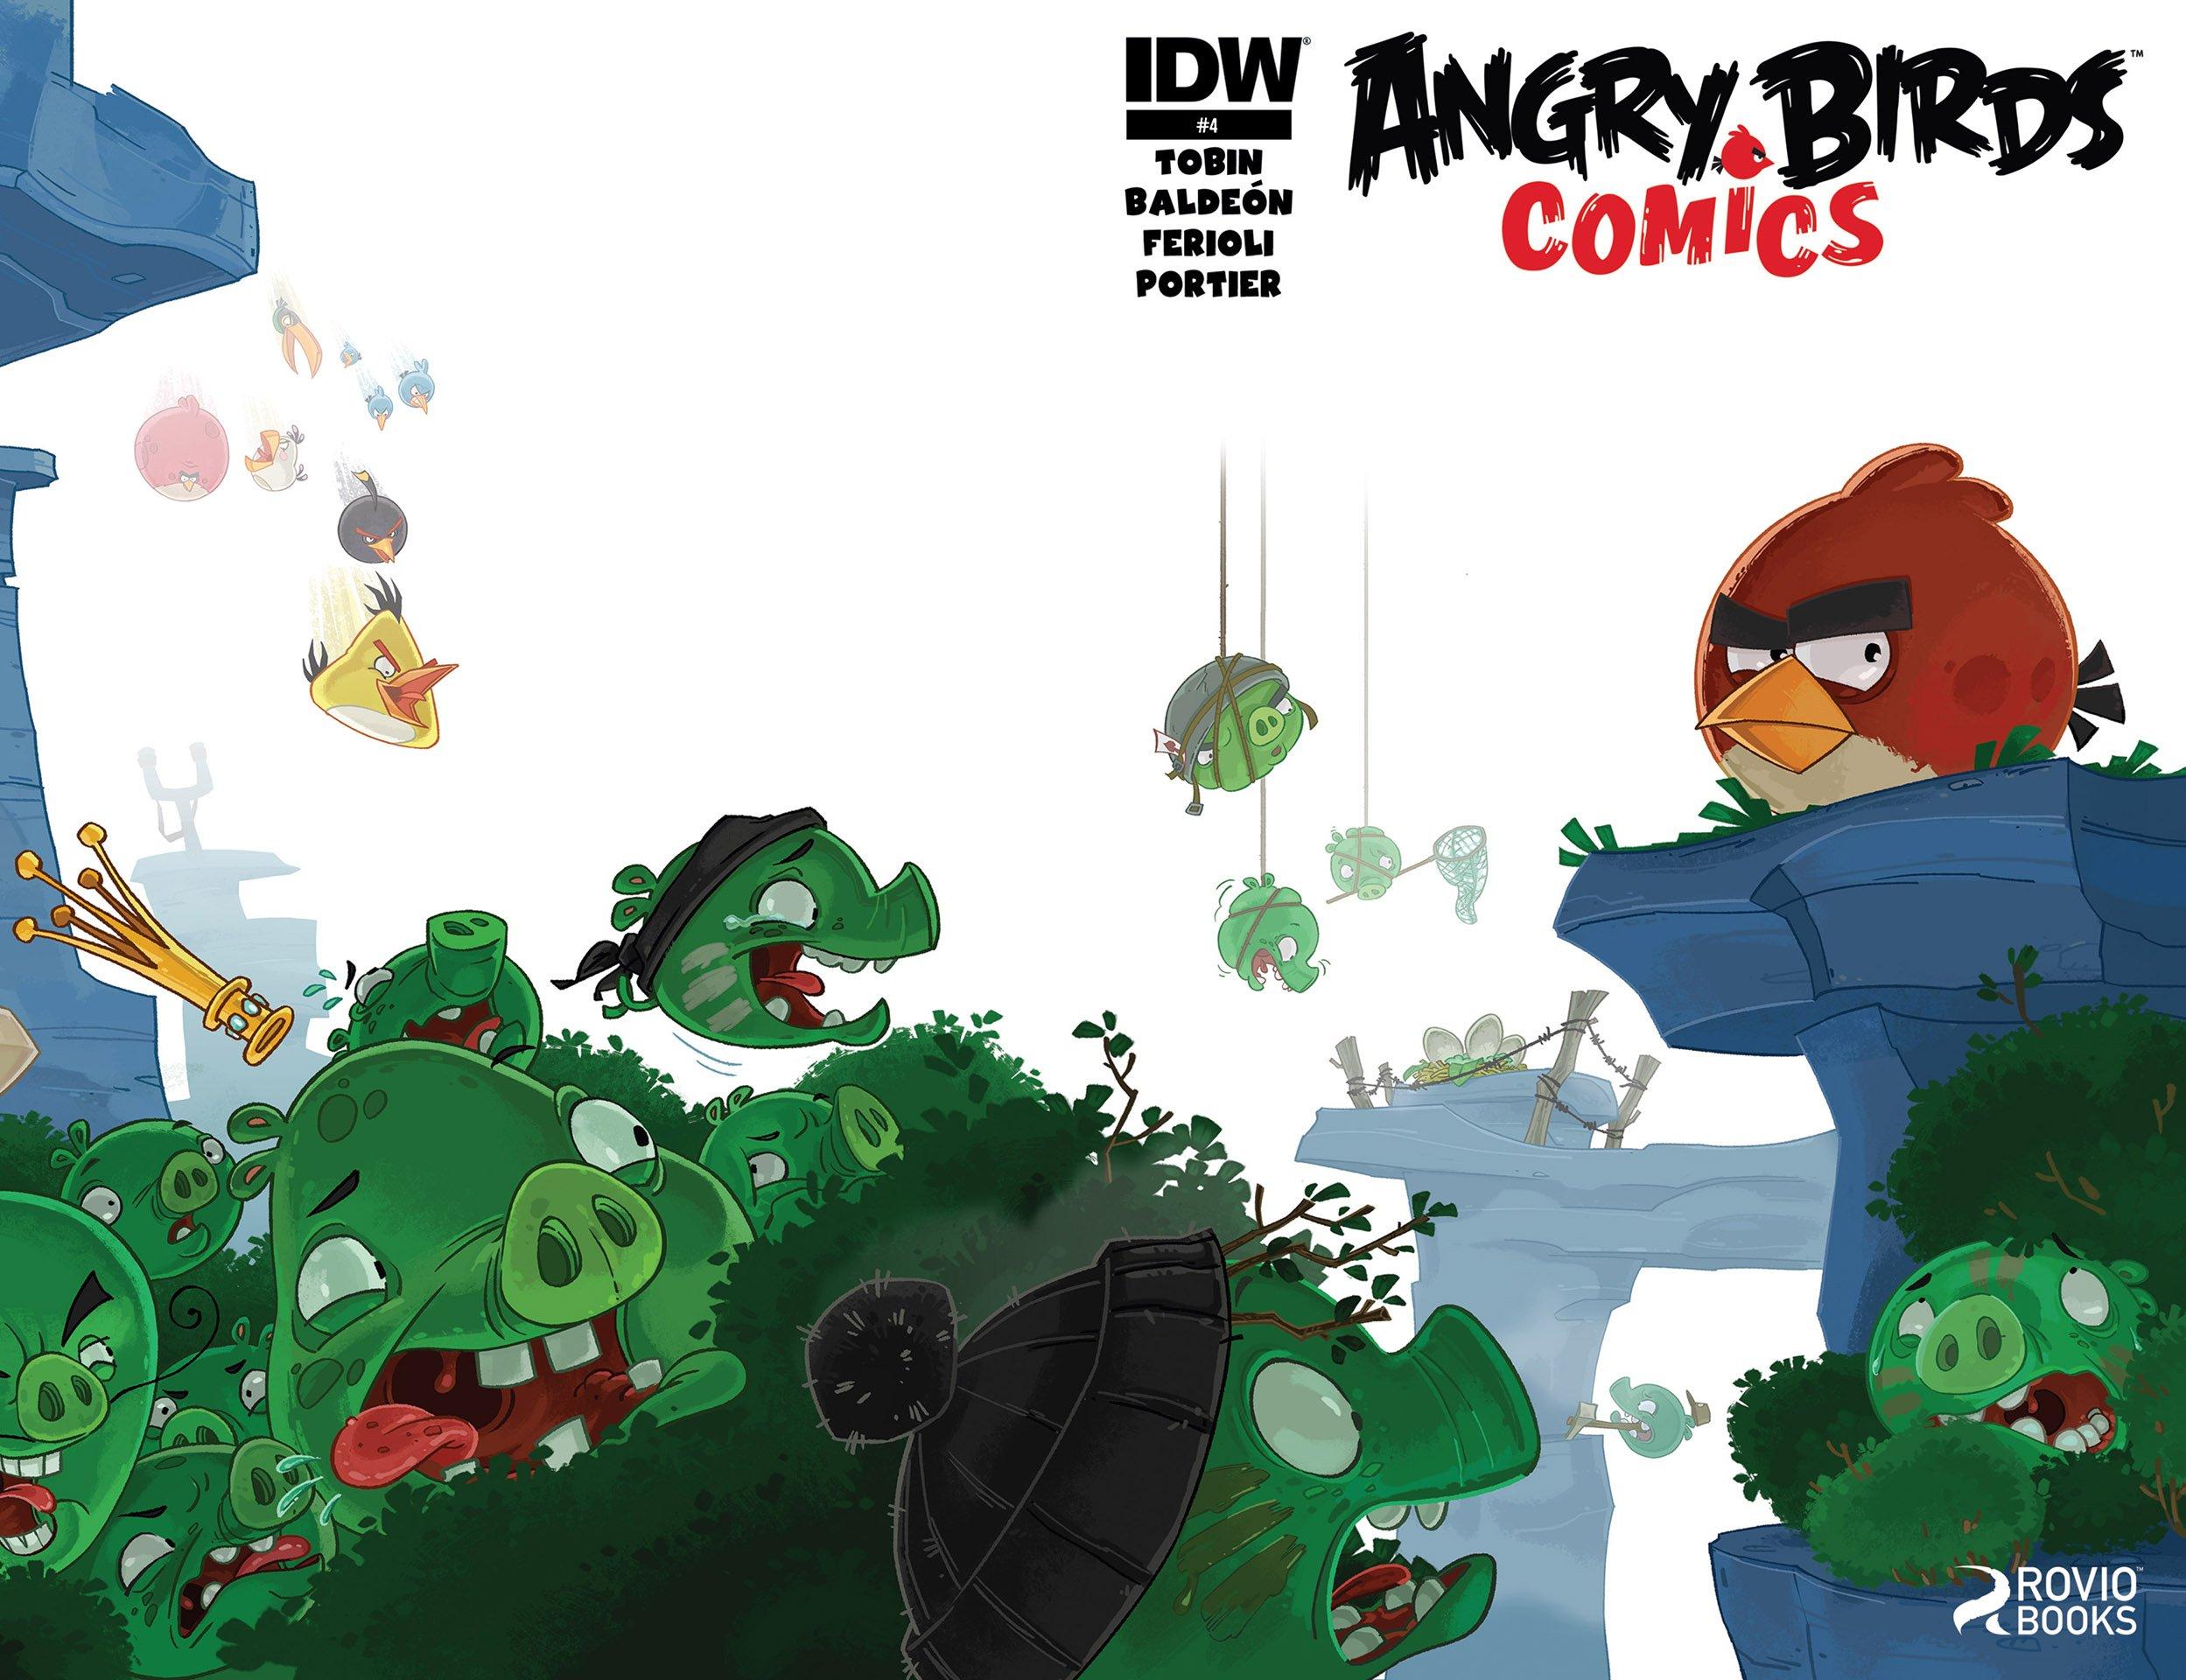 Angry Birds Comics 04 (September 2014)